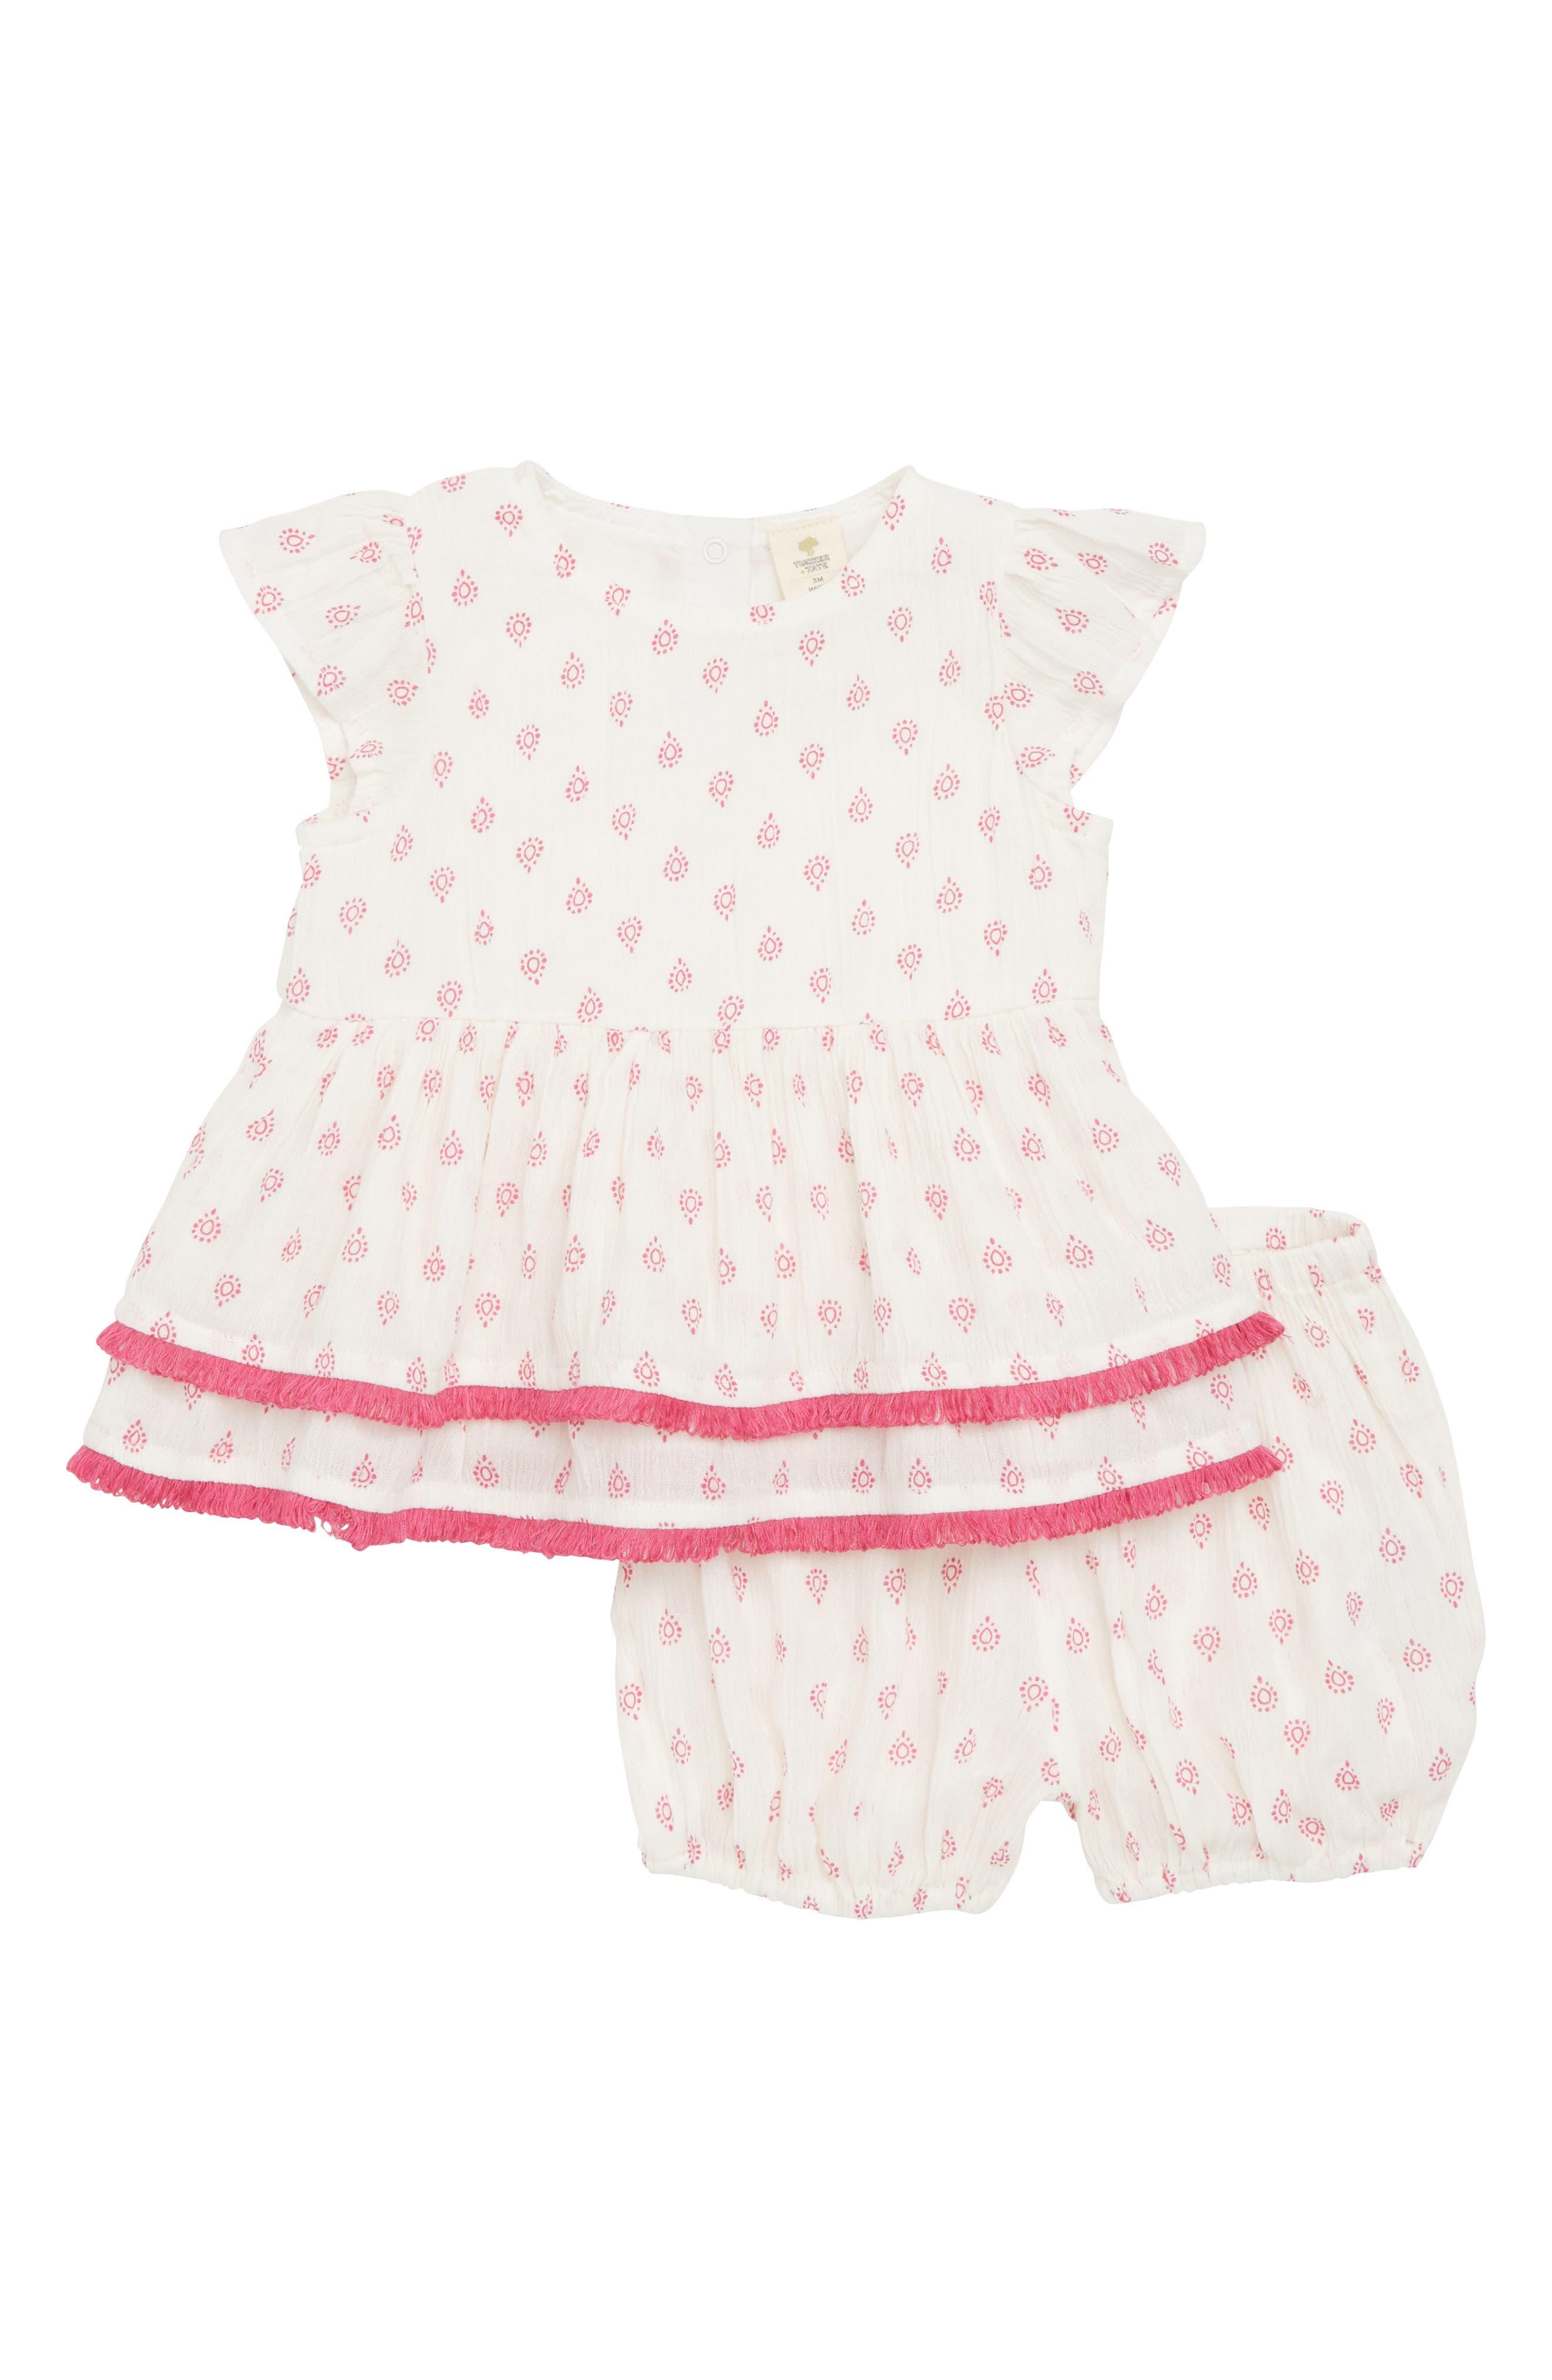 Flutter Sleeve Dress,                             Main thumbnail 1, color,                             900